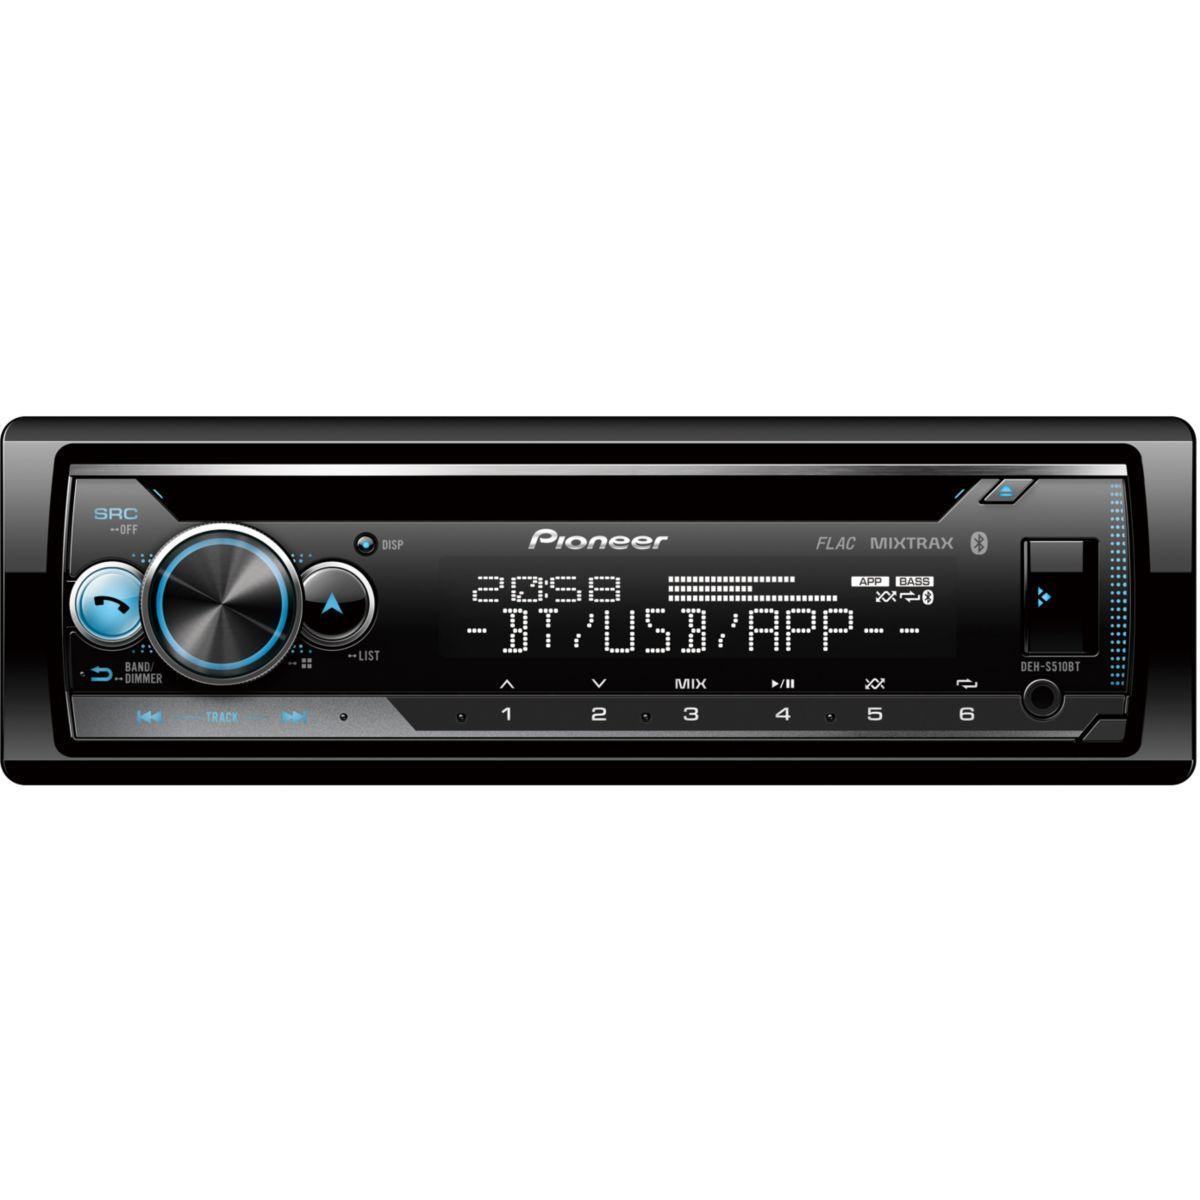 Autoradio cd pioneer deh-s510bt mixtrax cd usb ipod bluetooth - livraison offerte : code livprem (photo)